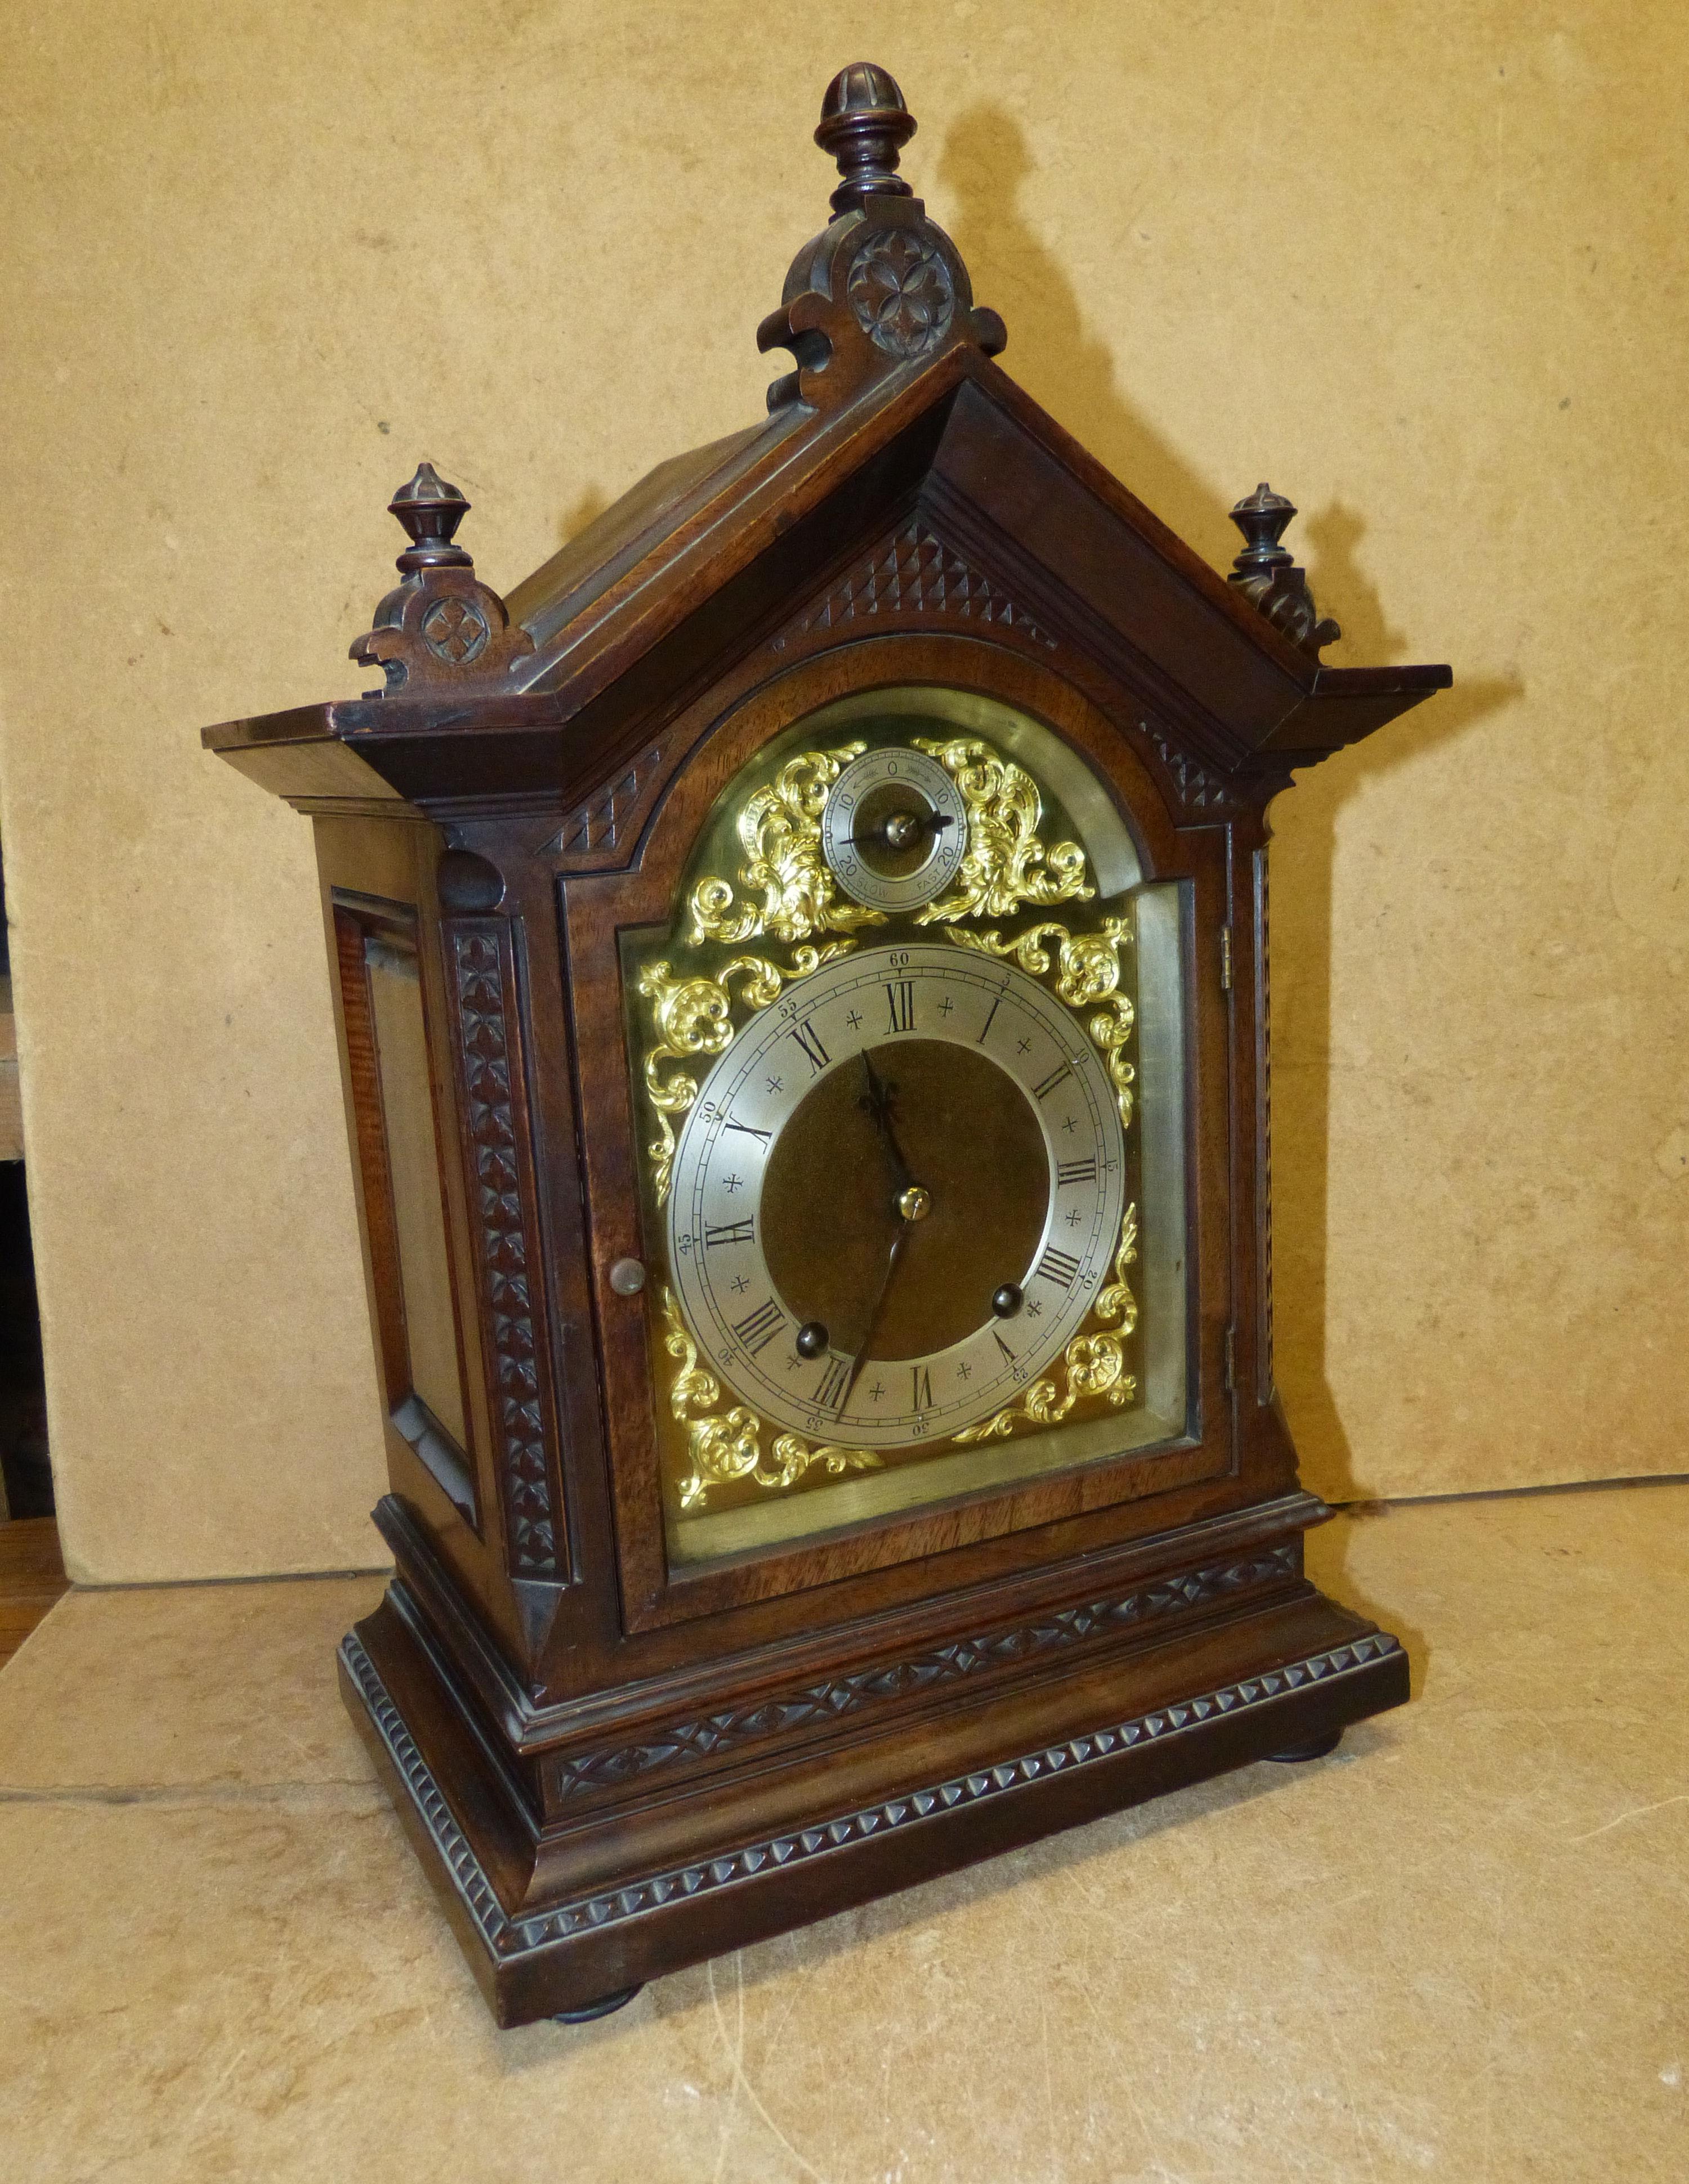 W & H 8 Day Striking Walnut Mantel Clock having turned finial